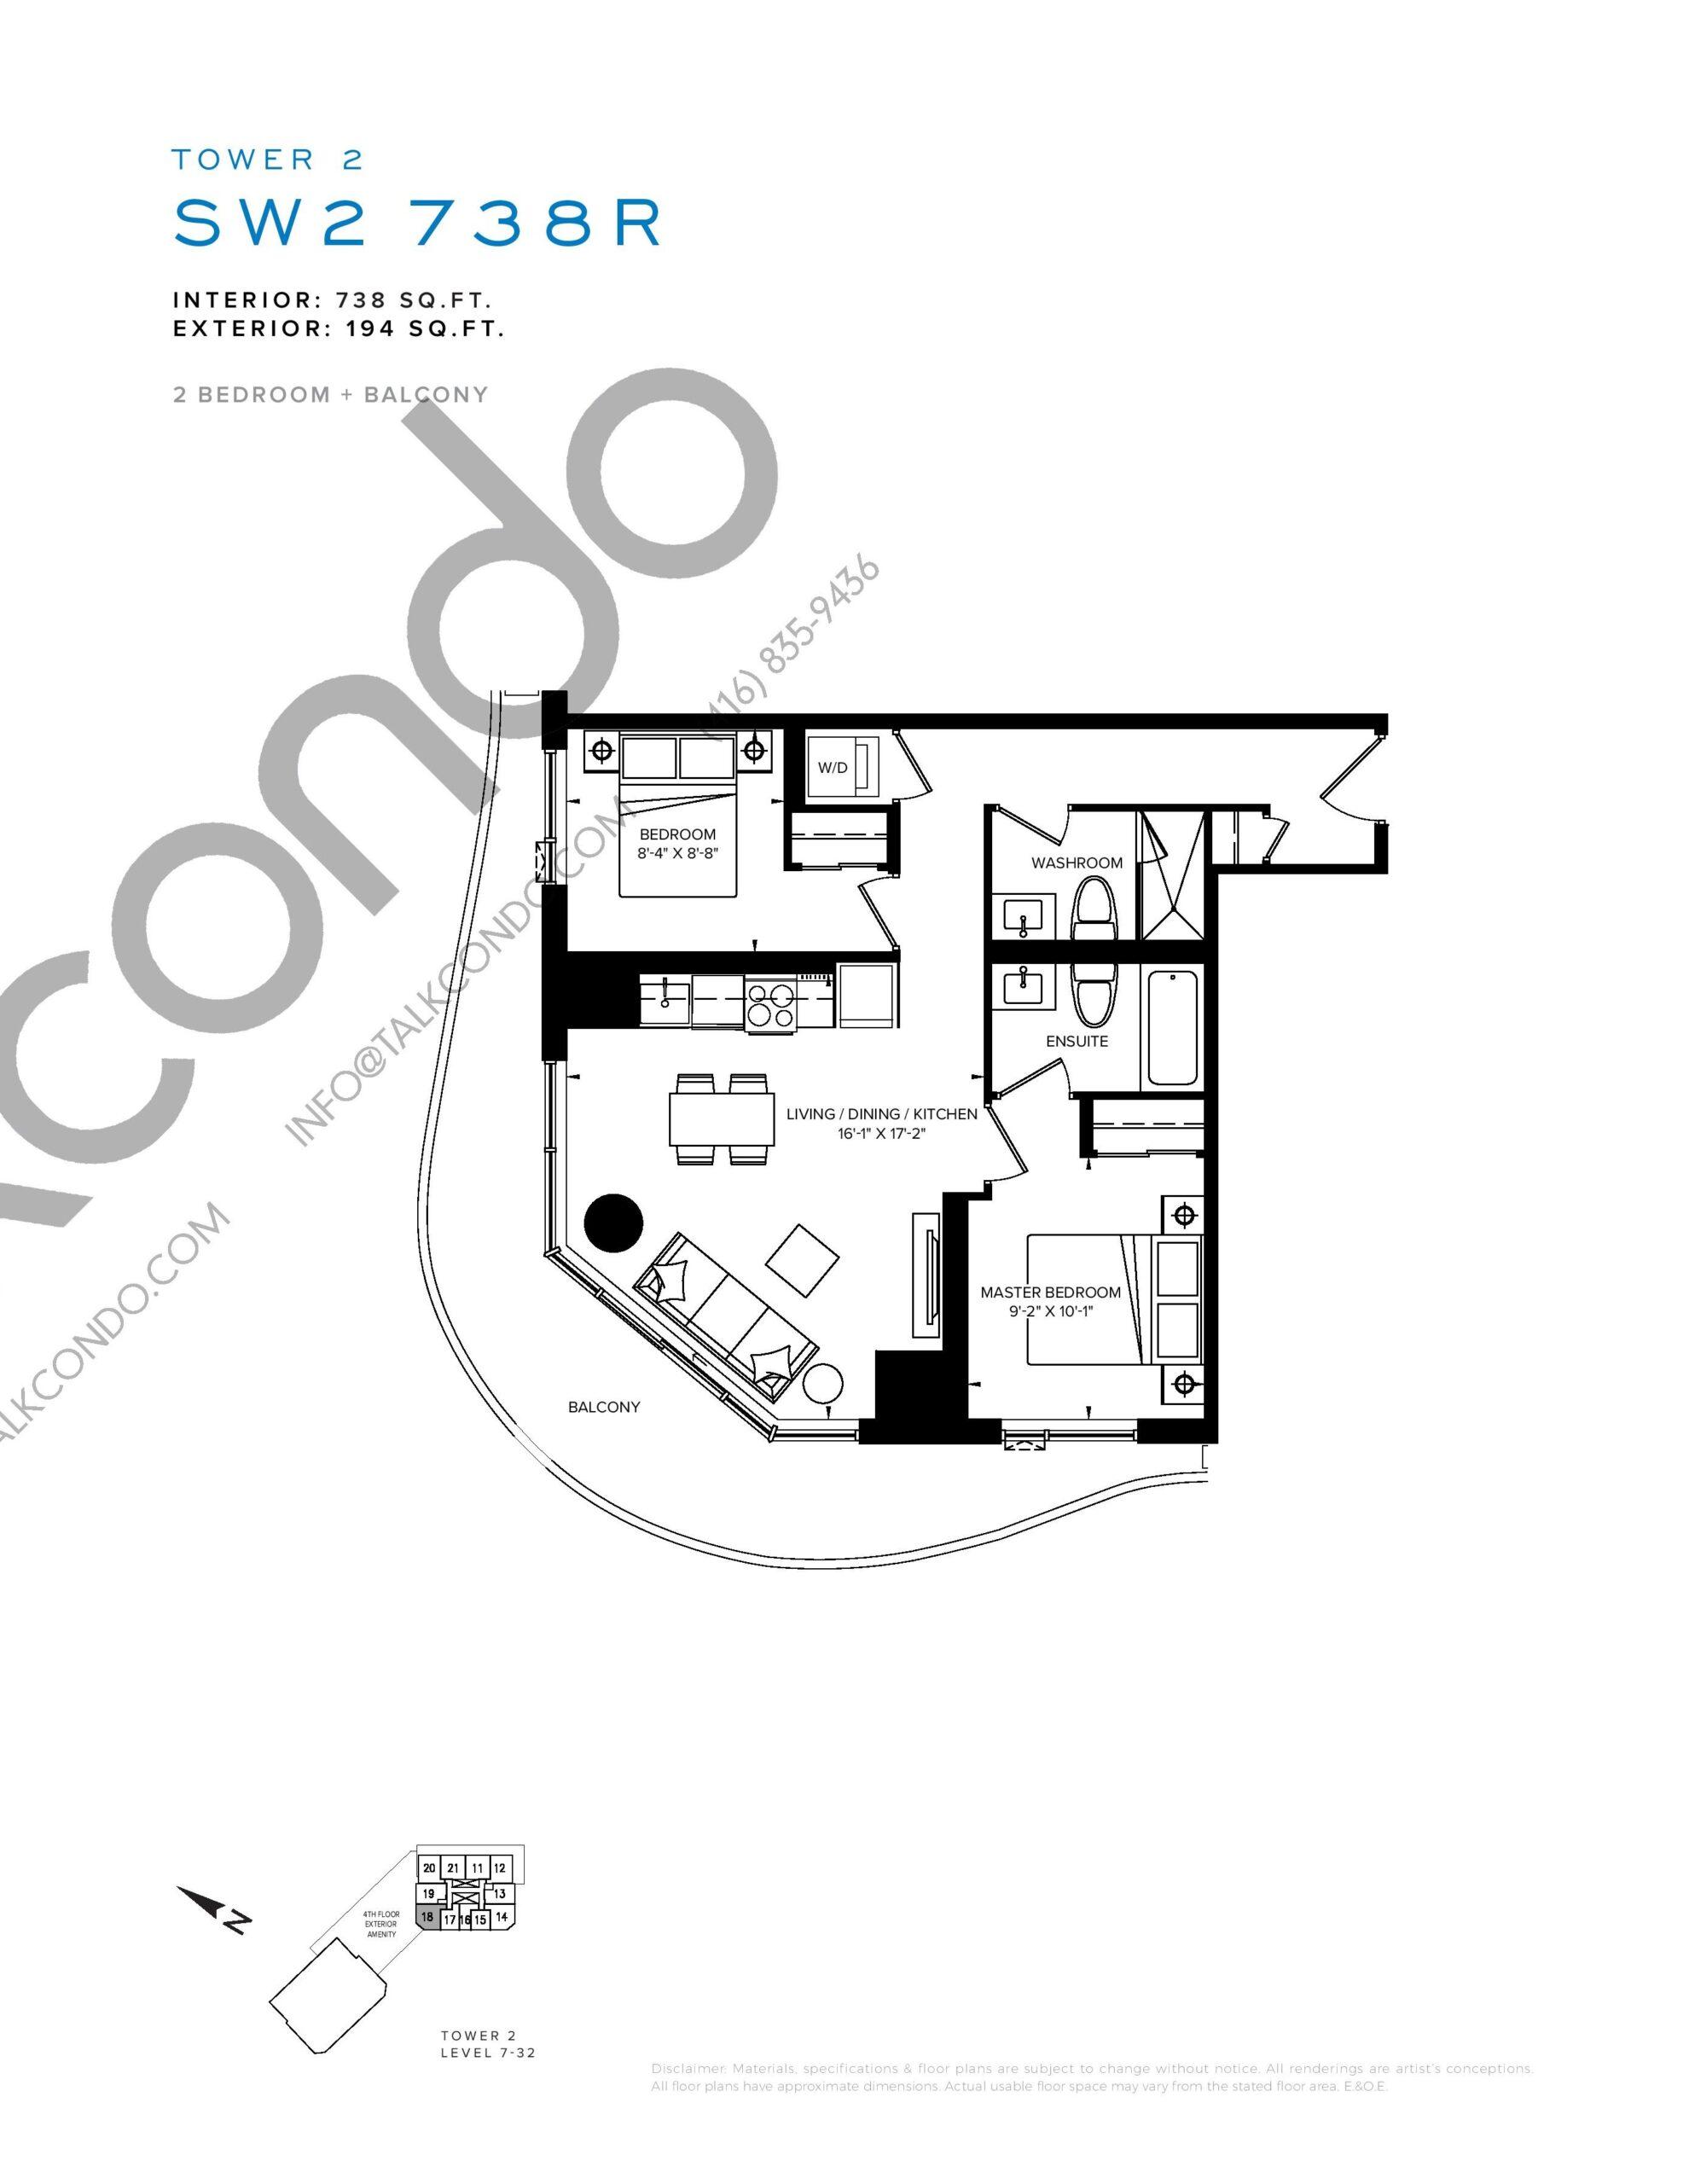 SW2 738R Floor Plan at SXSW Tower 2 Condos (SXSW2) - 738 sq.ft